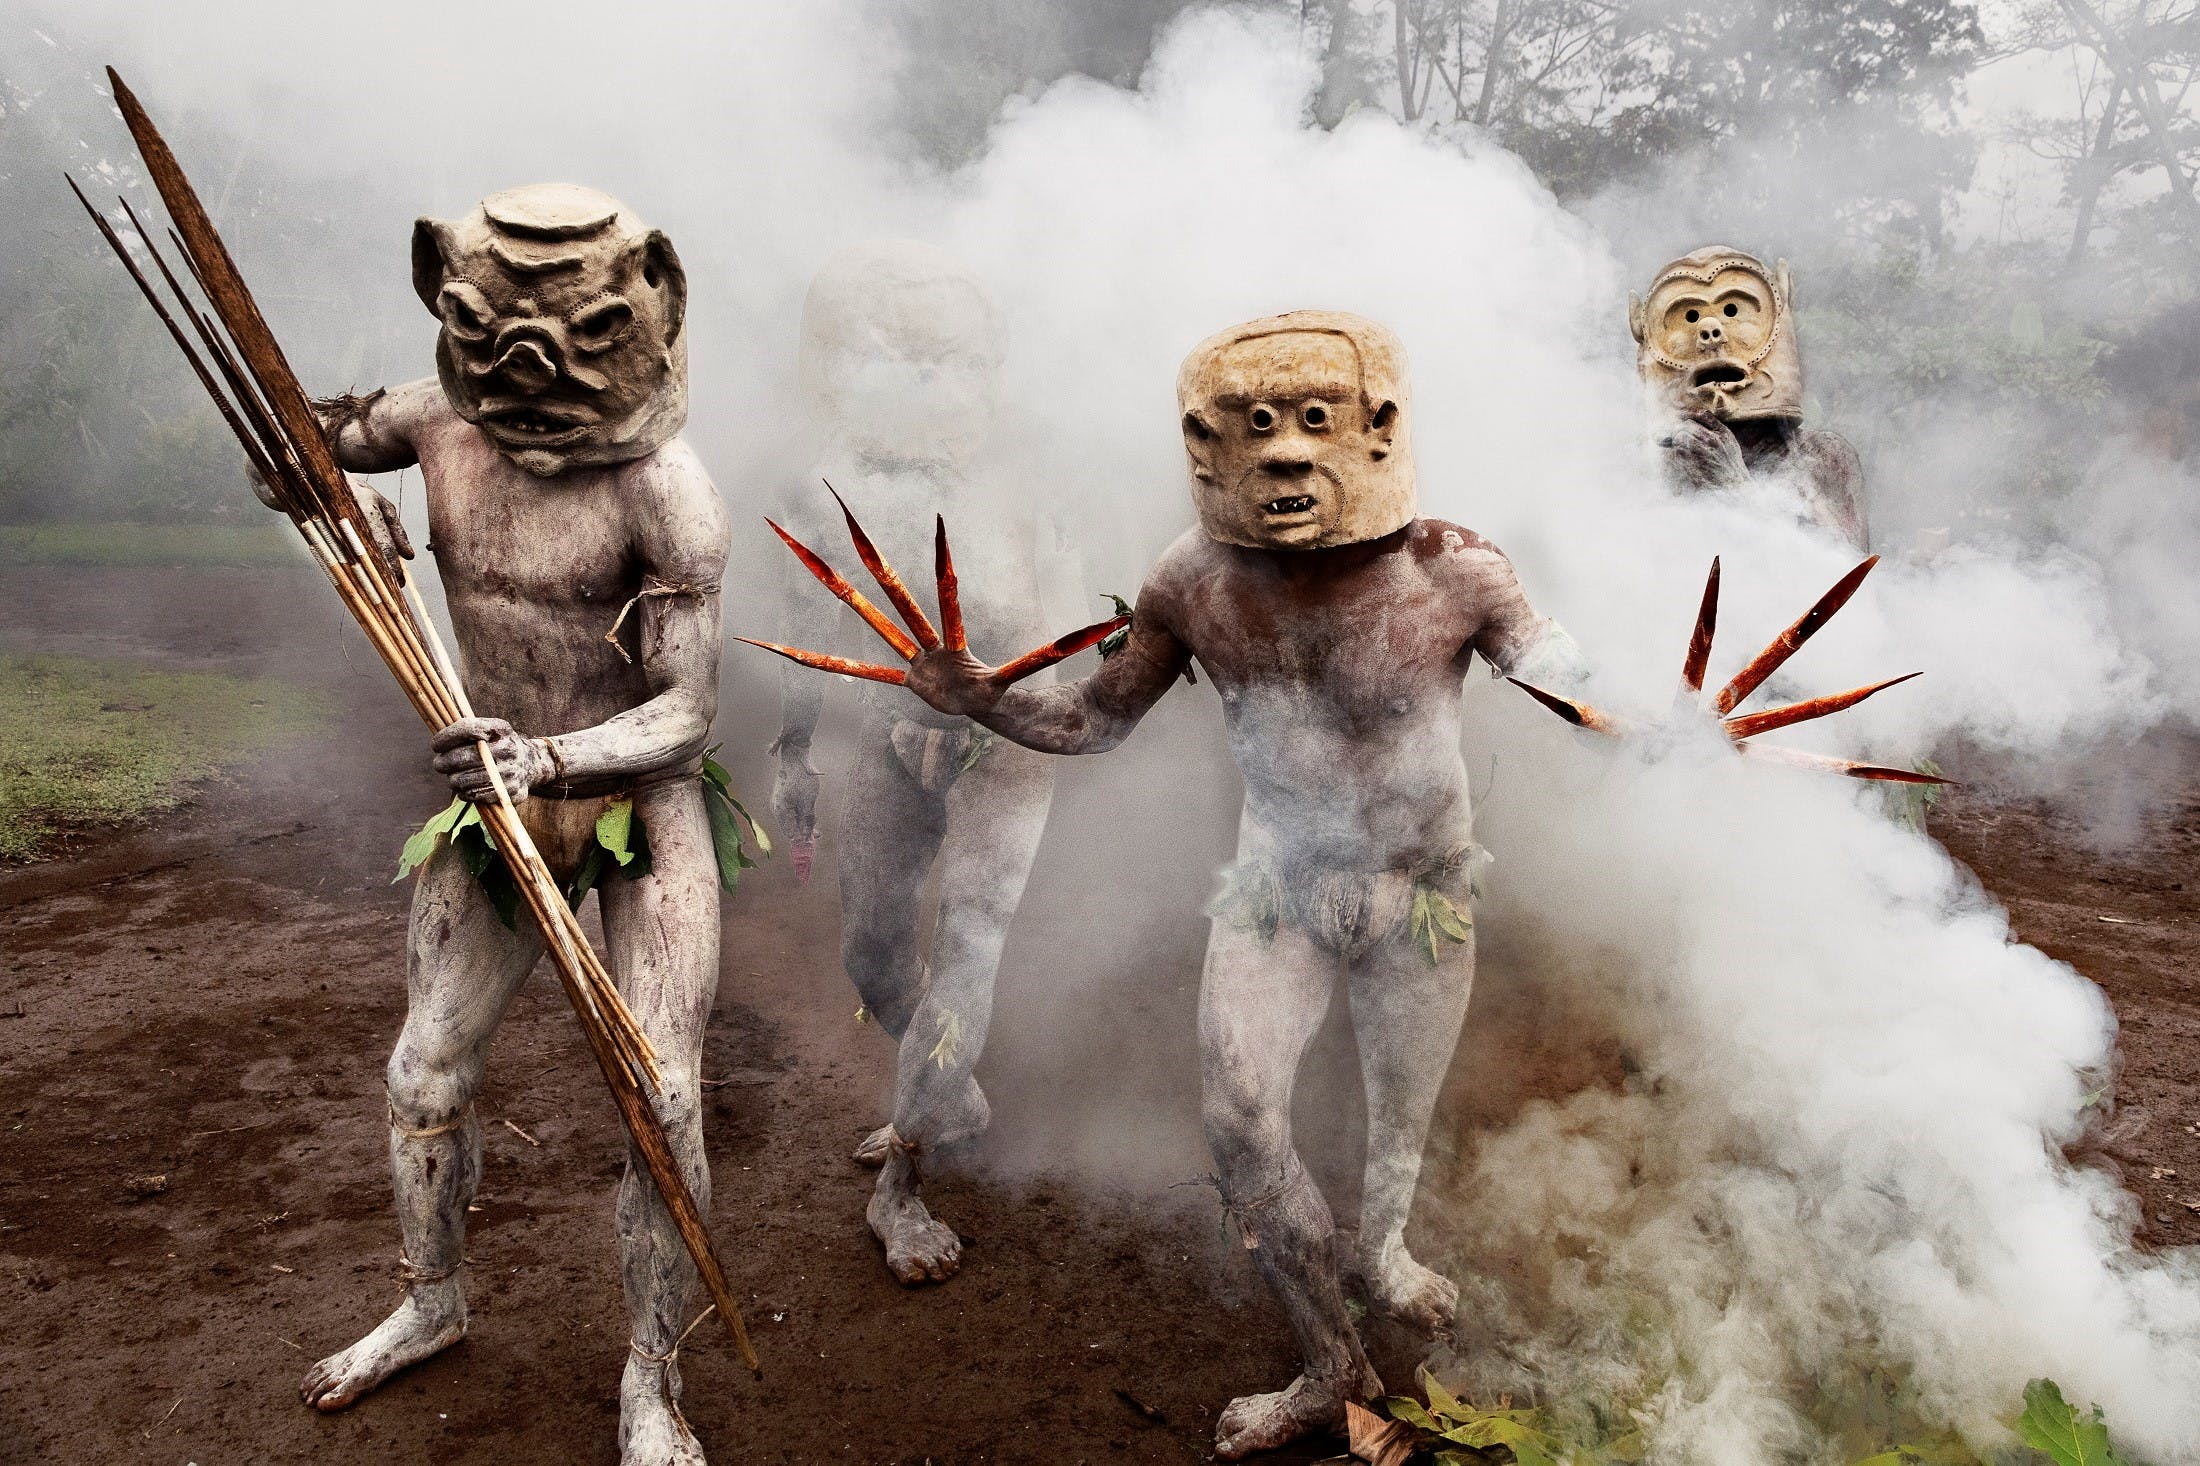 Papua New Guinea by Steve McCurry